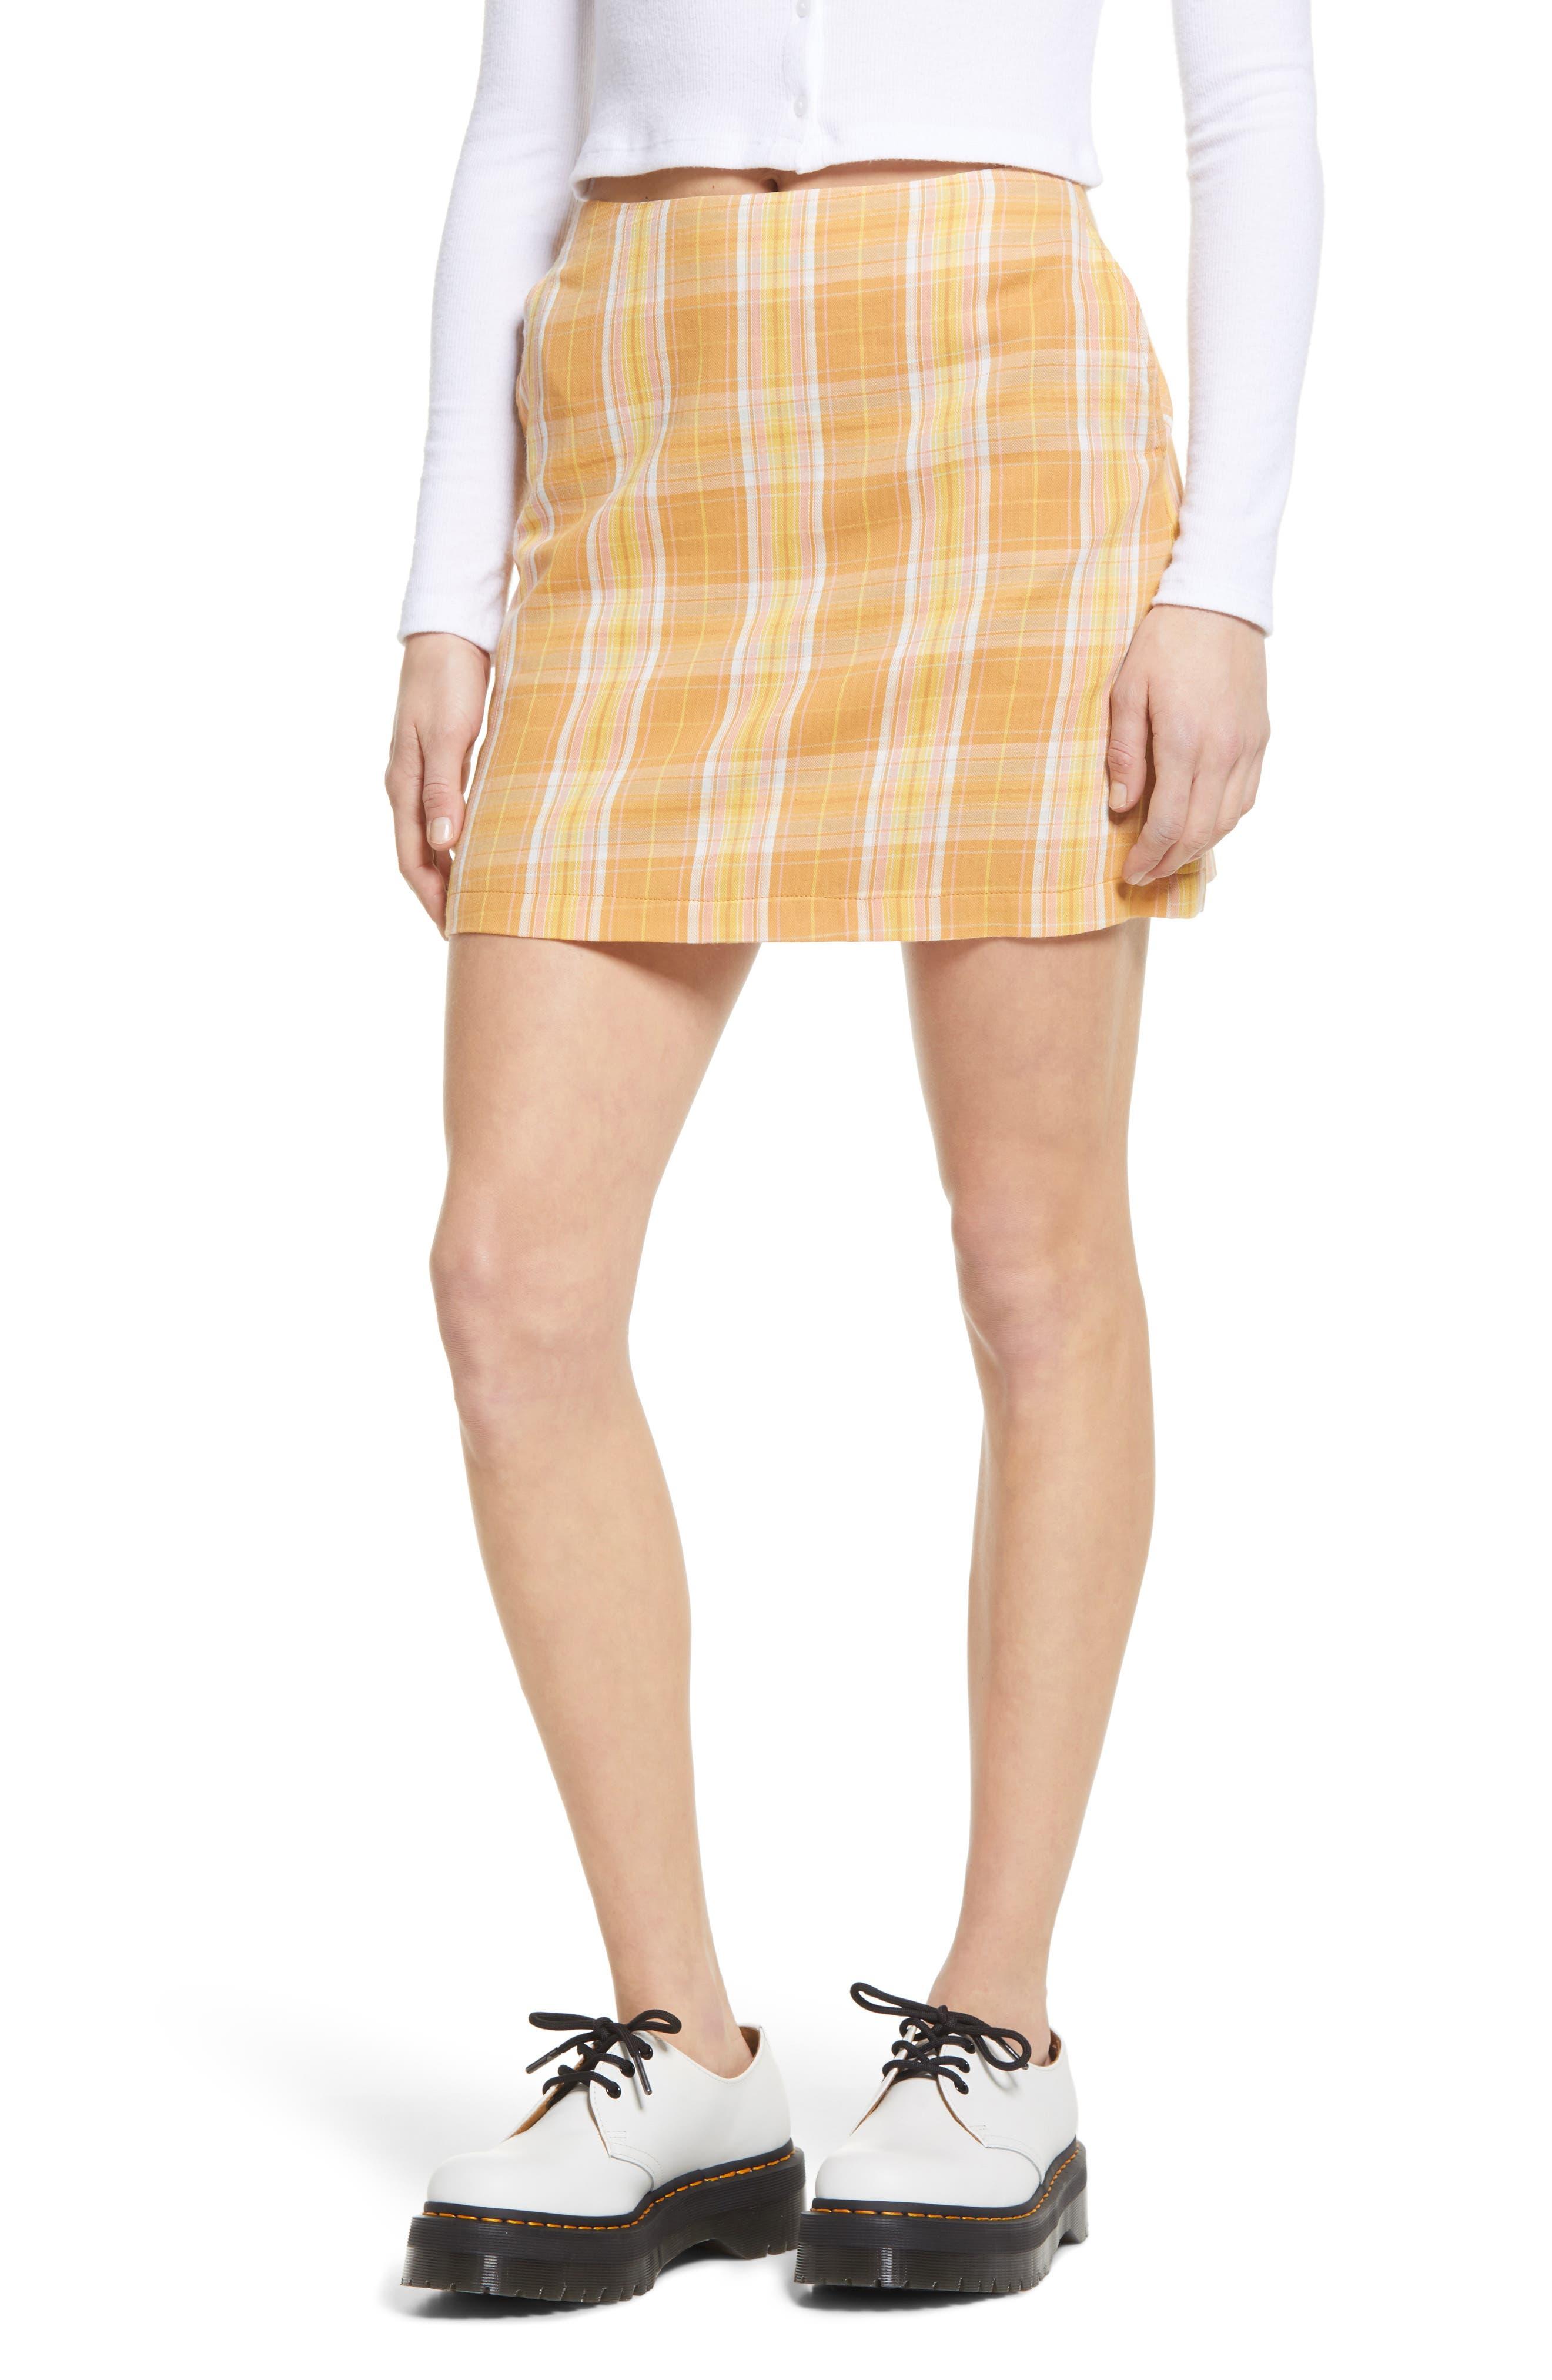 WOOL ALEX /& Co Vintage  Check Pattern Long Skirt